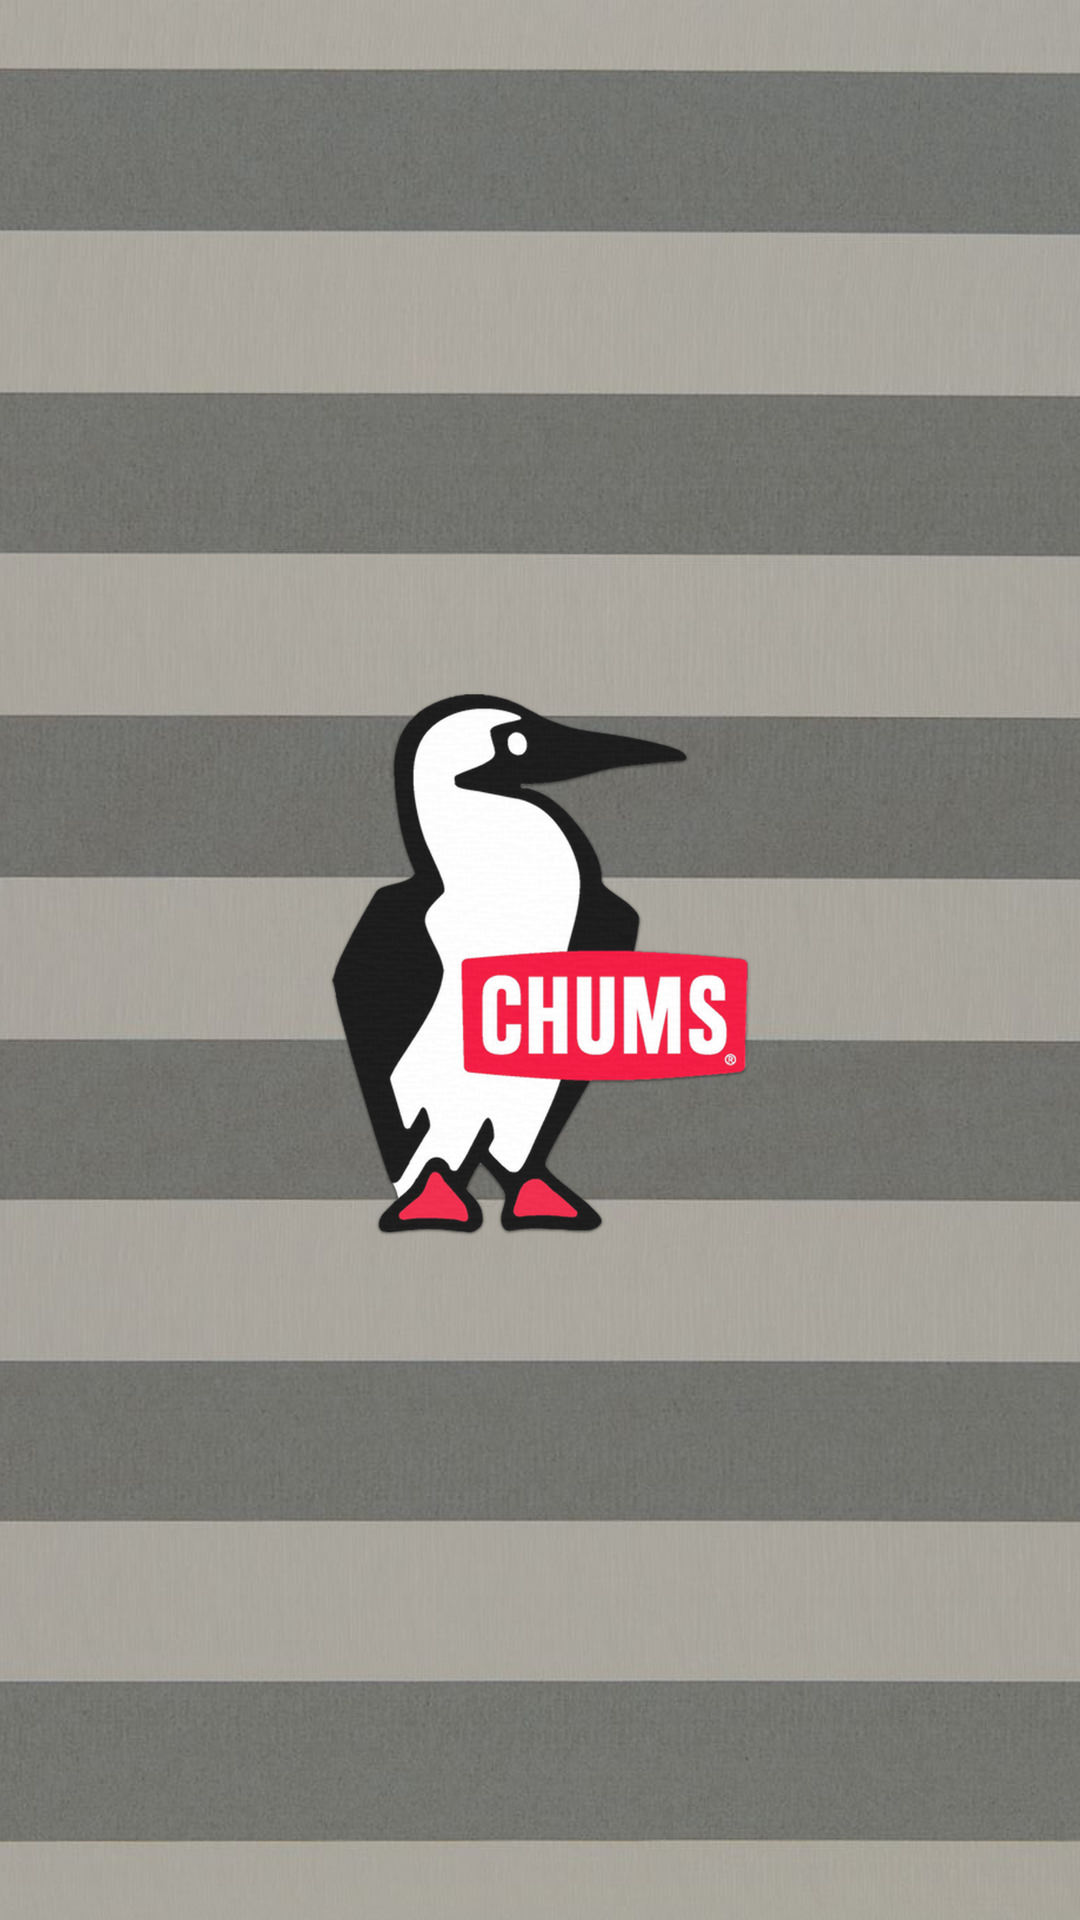 chums19 - CHUMS[チャムス]の高画質スマホ壁紙50枚 [iPhone&Androidに対応]